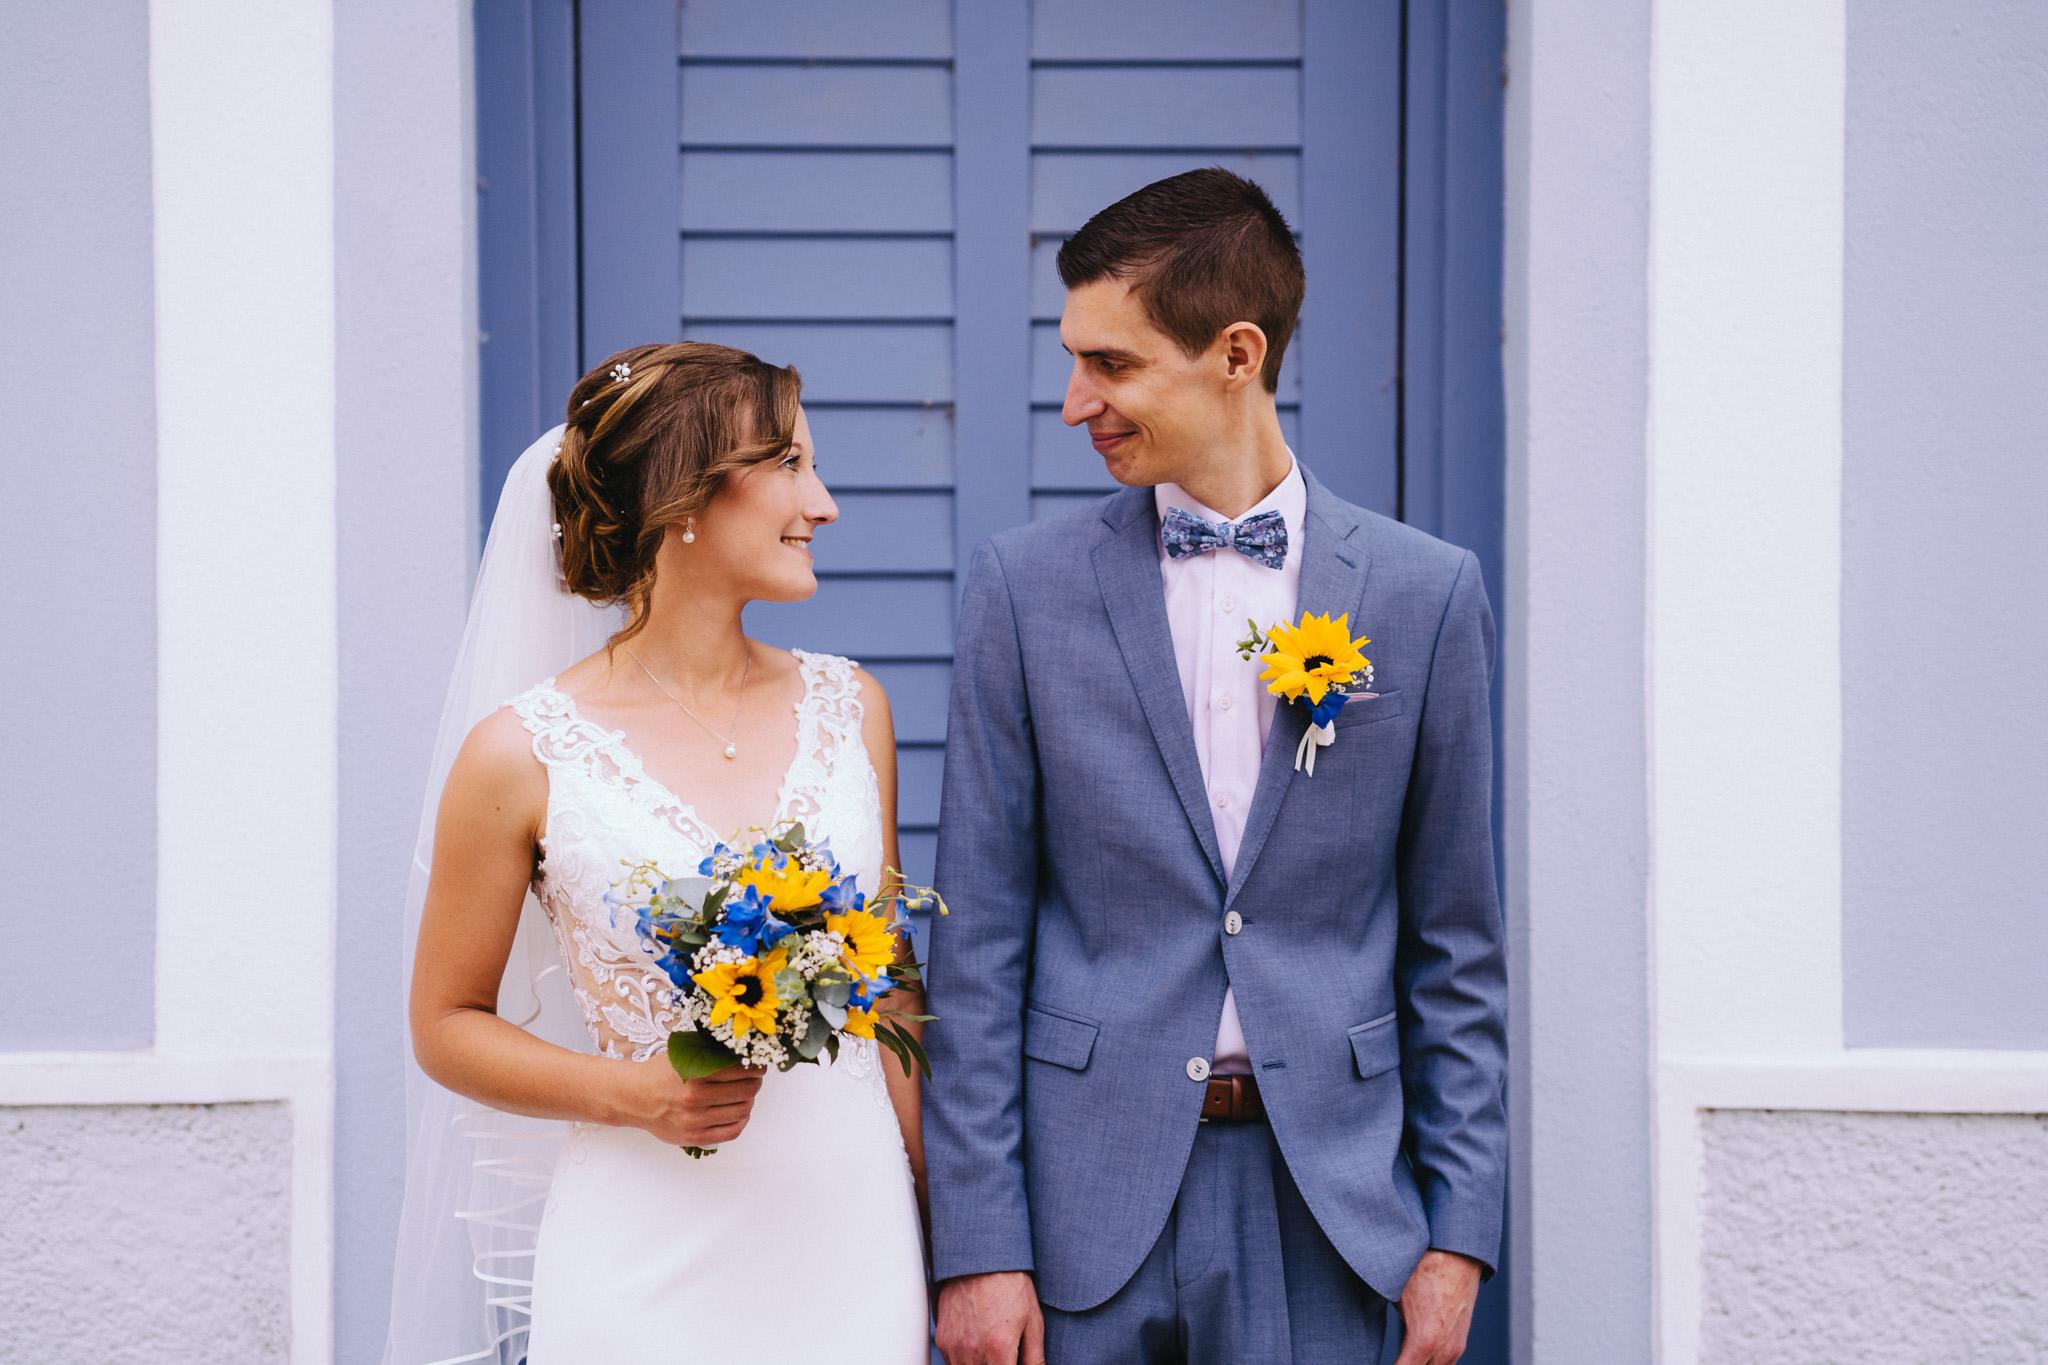 Brautpaarshooting vor blauer Tür